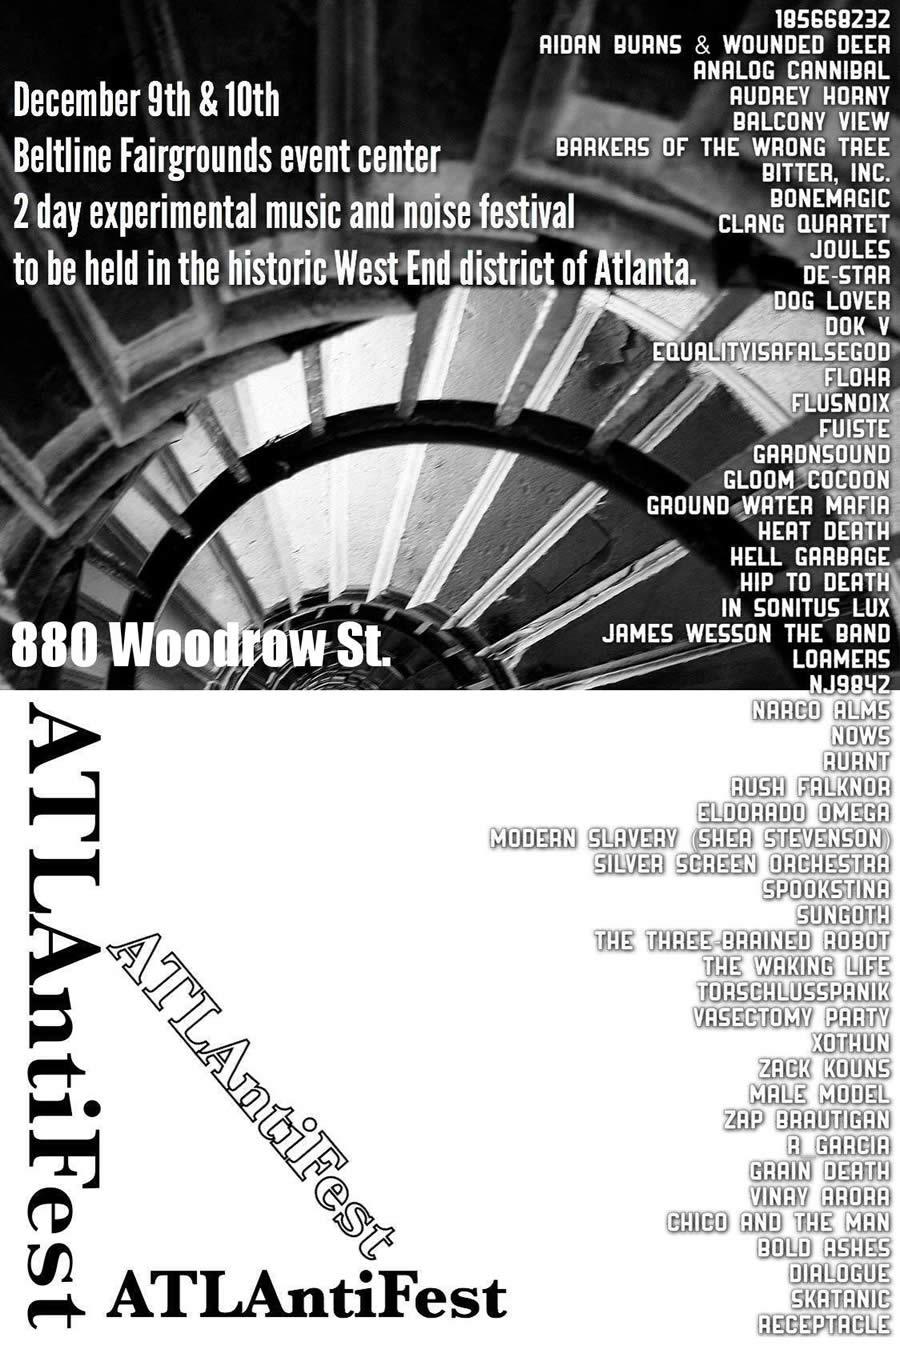 ATLAntiFest Flyer